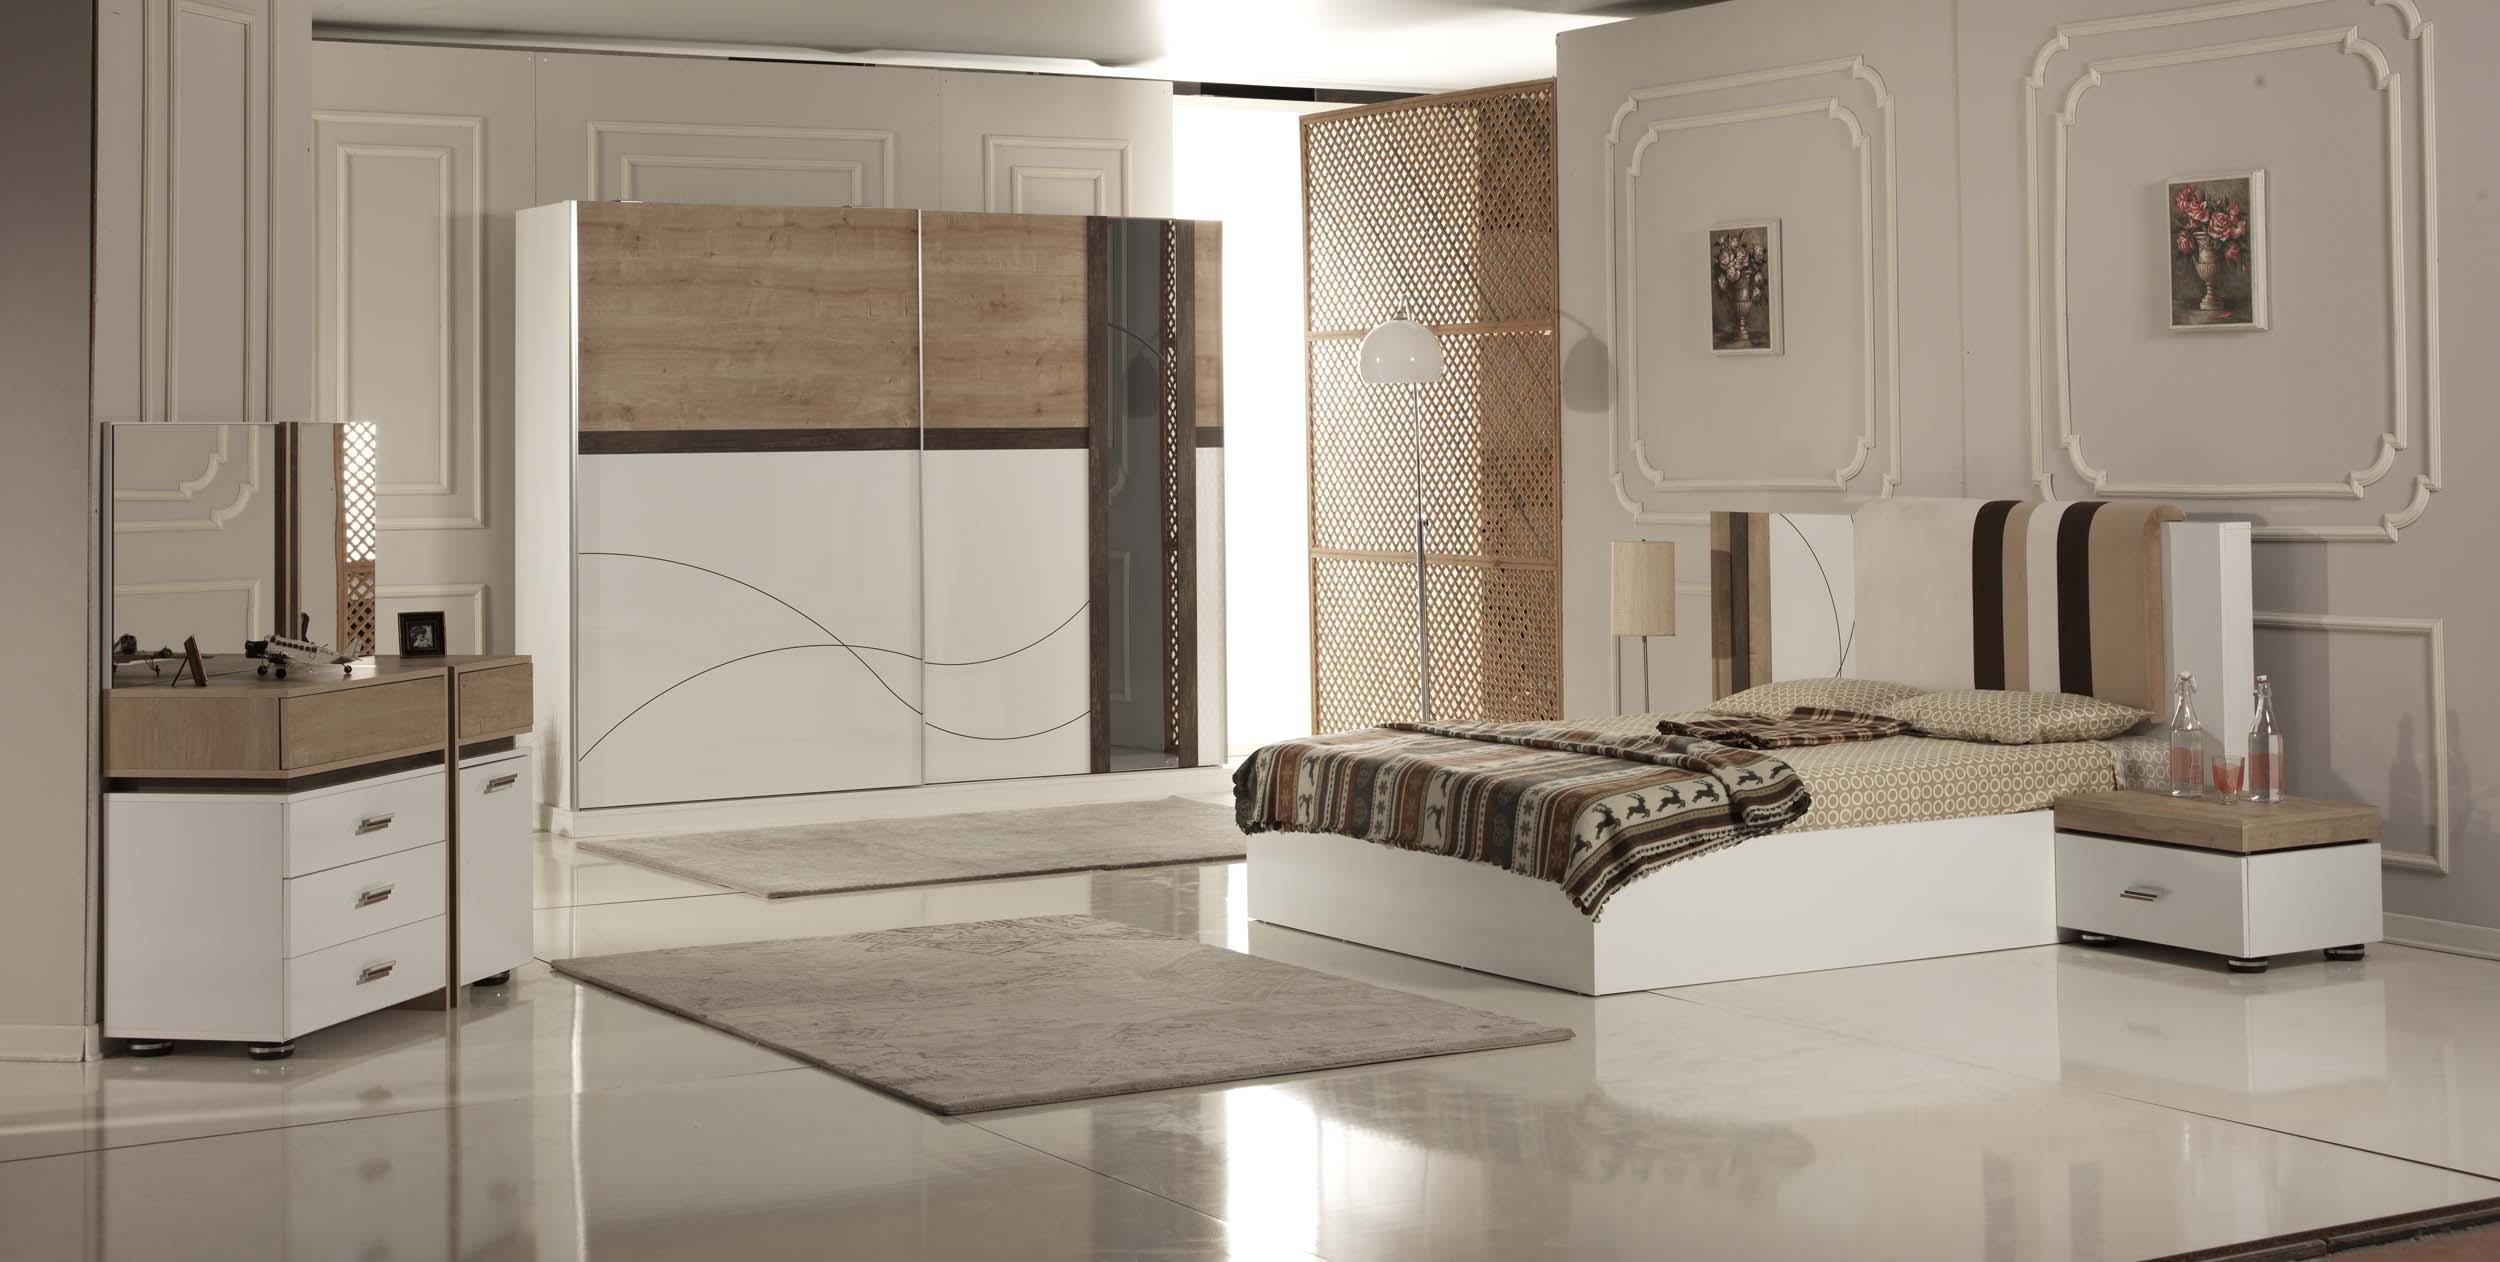 Emejing chambre a coucher noir tunisie ideas for Ballouchi tunisie meuble